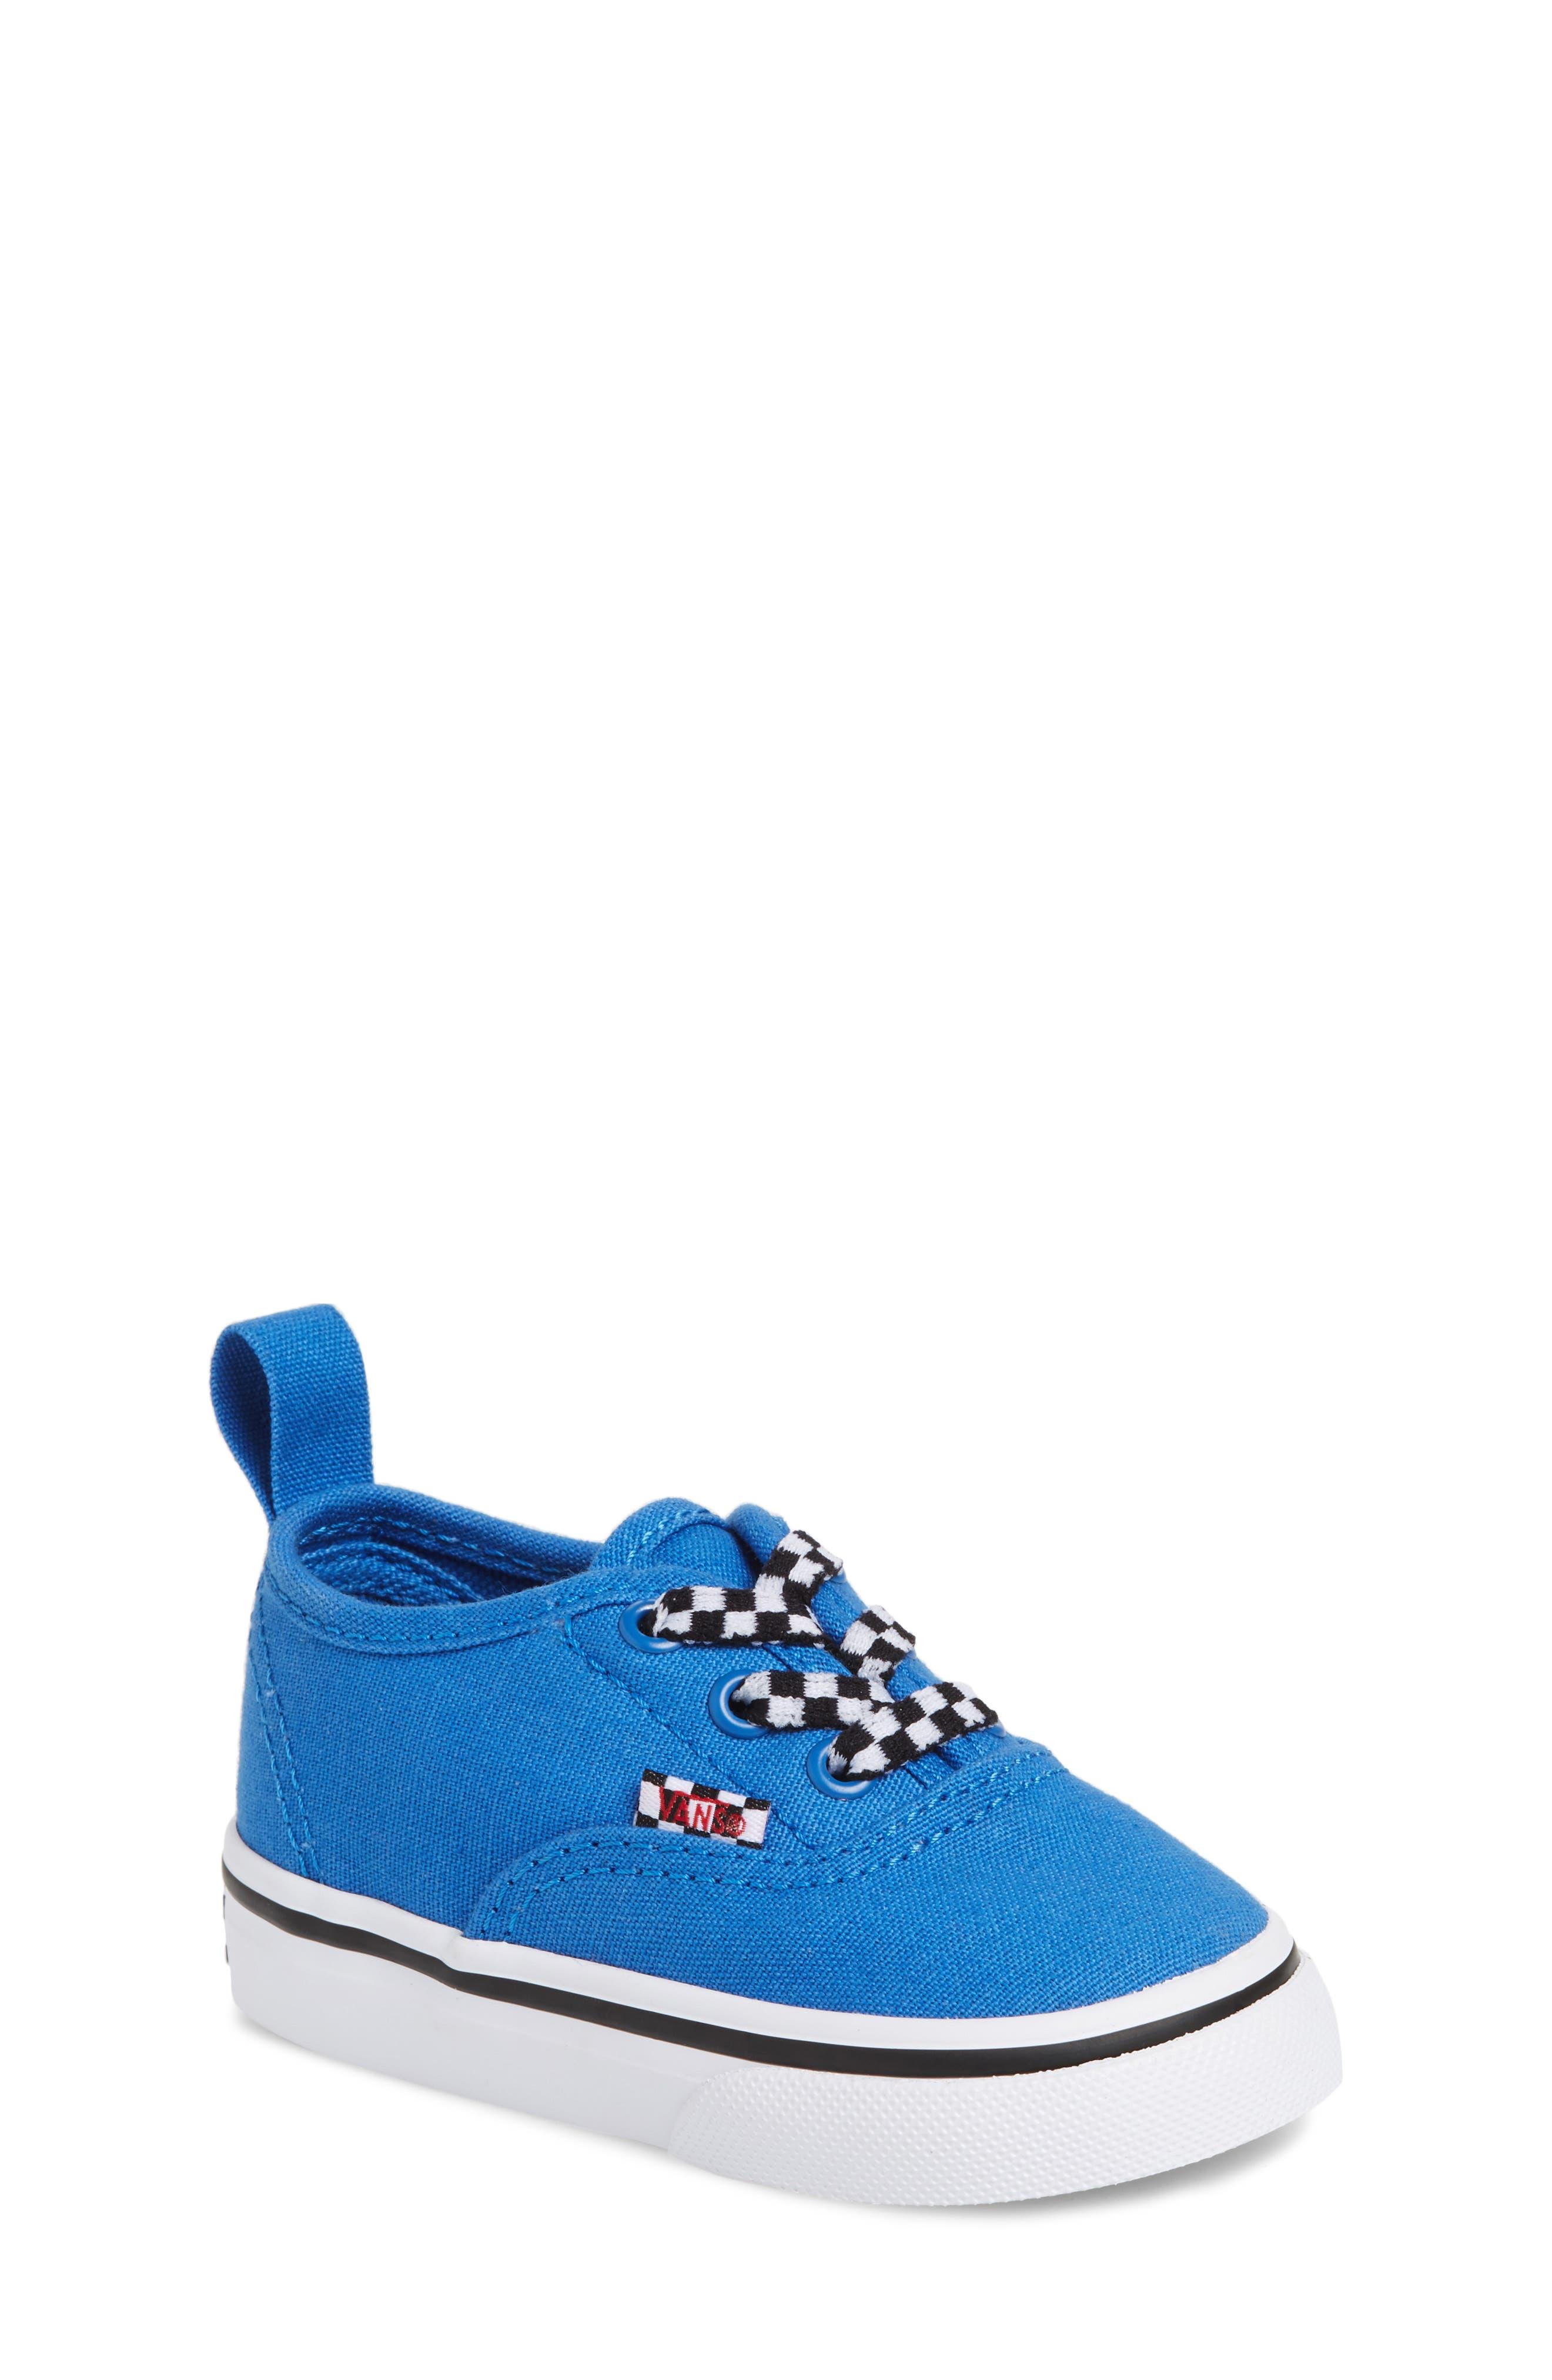 Authentic Sneaker,                         Main,                         color, Blue/ White Check Lace